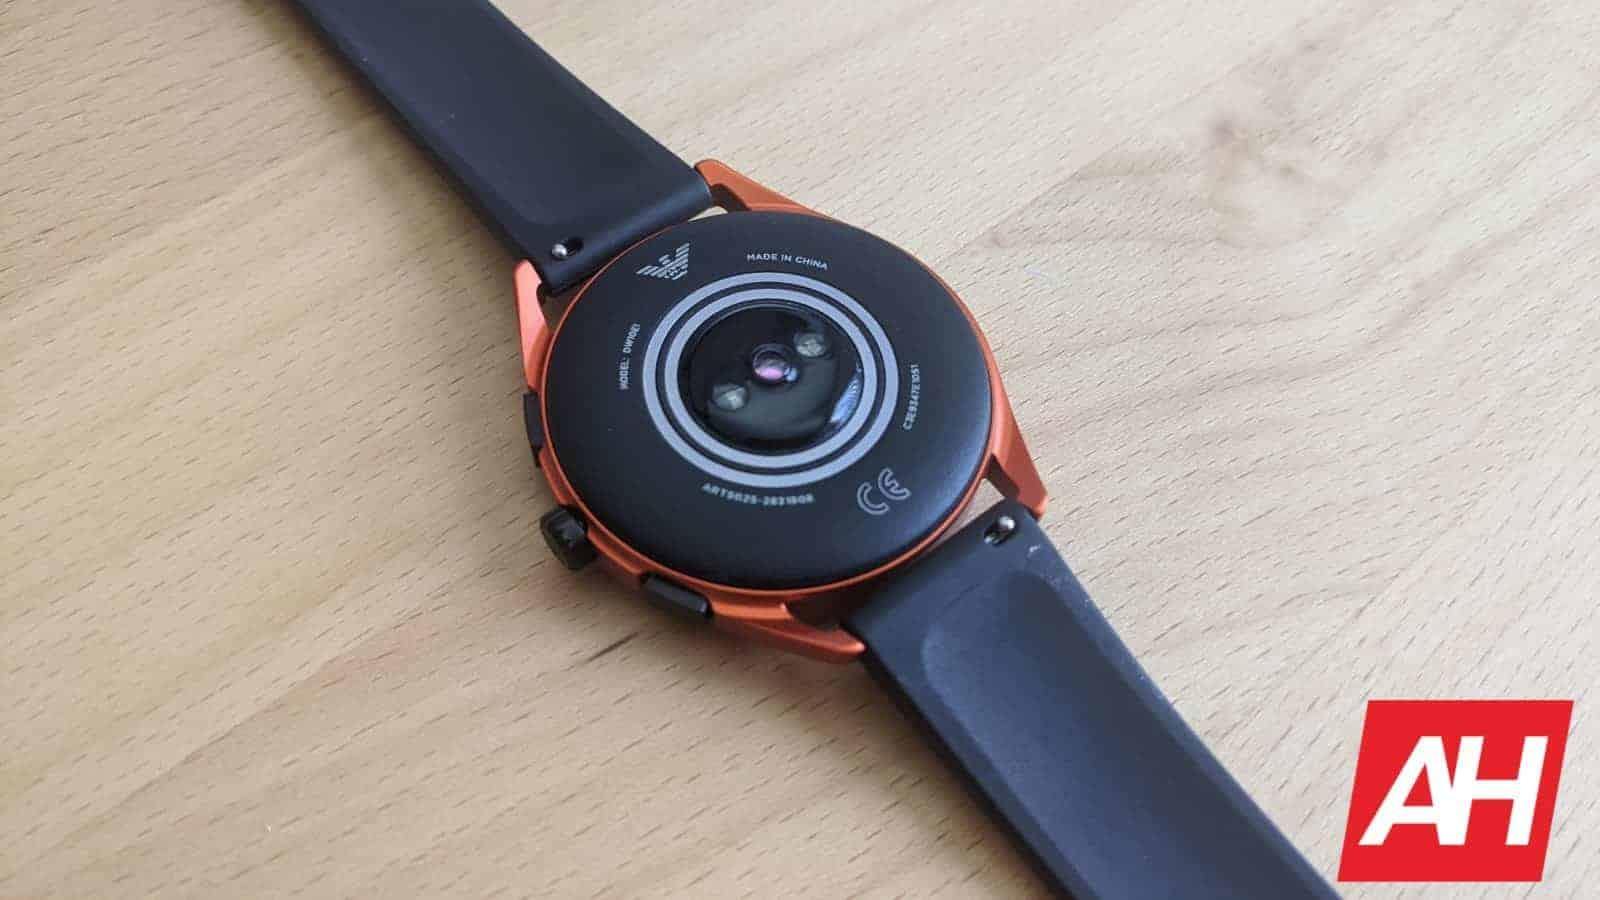 Emporio Armani Smartwatch 3 Review 6